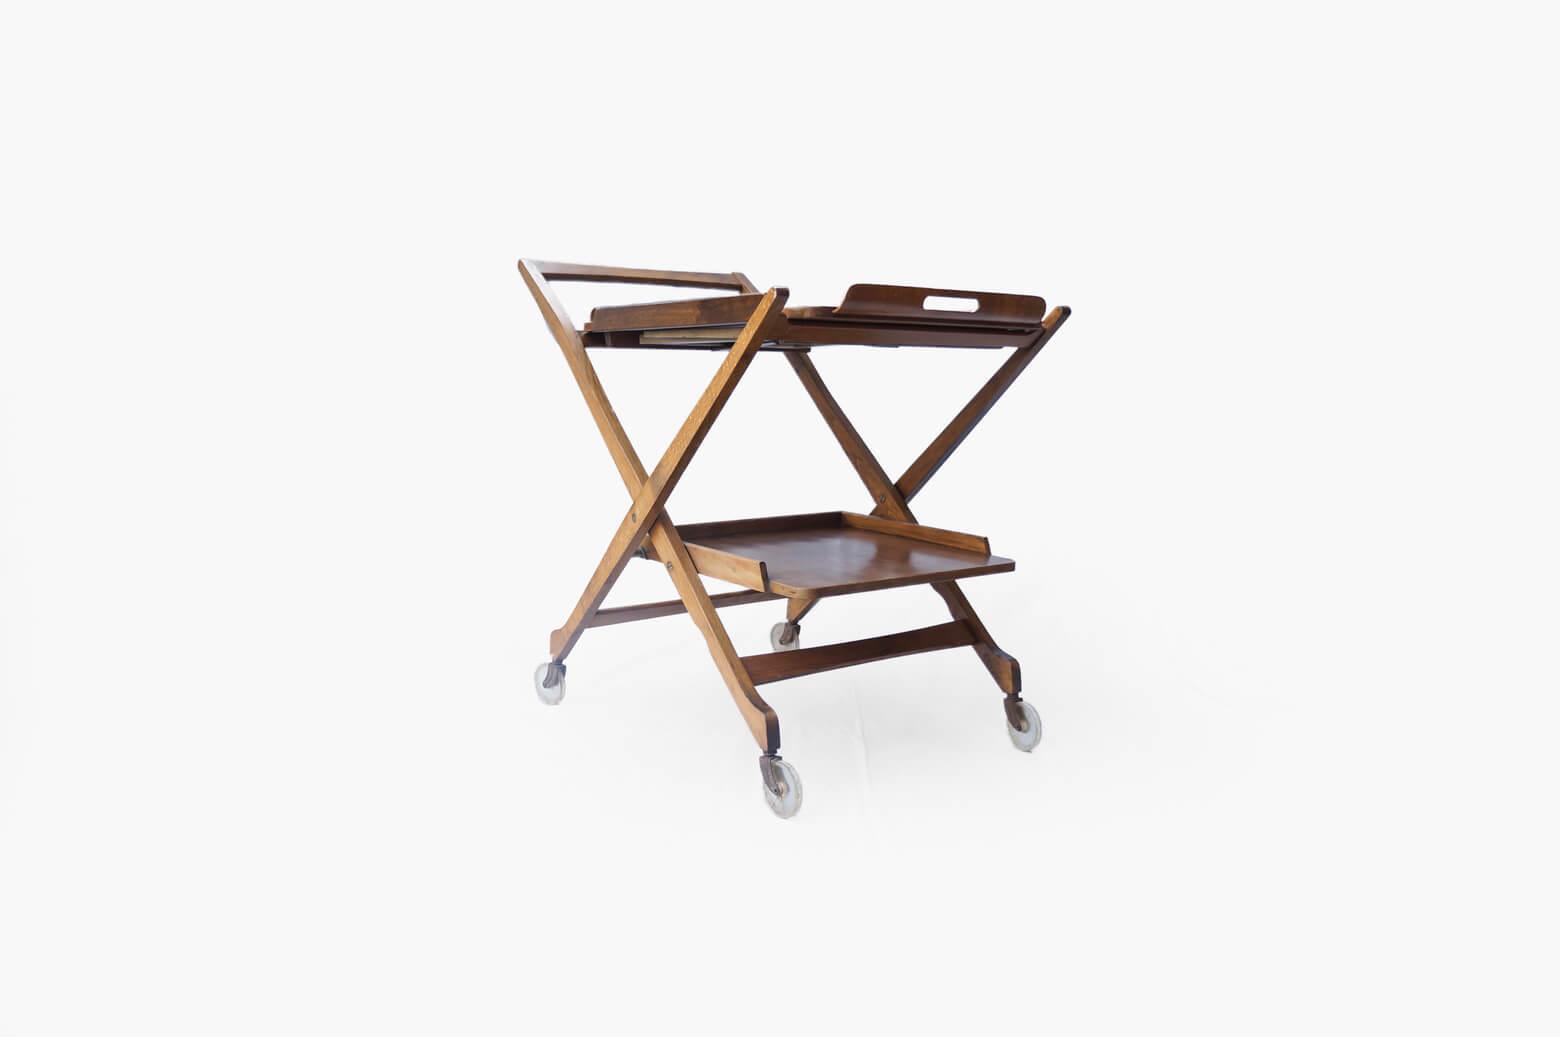 Yugoslavia Vintage NASCO Folding Bar Cart/ユーゴスラビア ヴィンテージ ナスコ 折りたたみバーカート